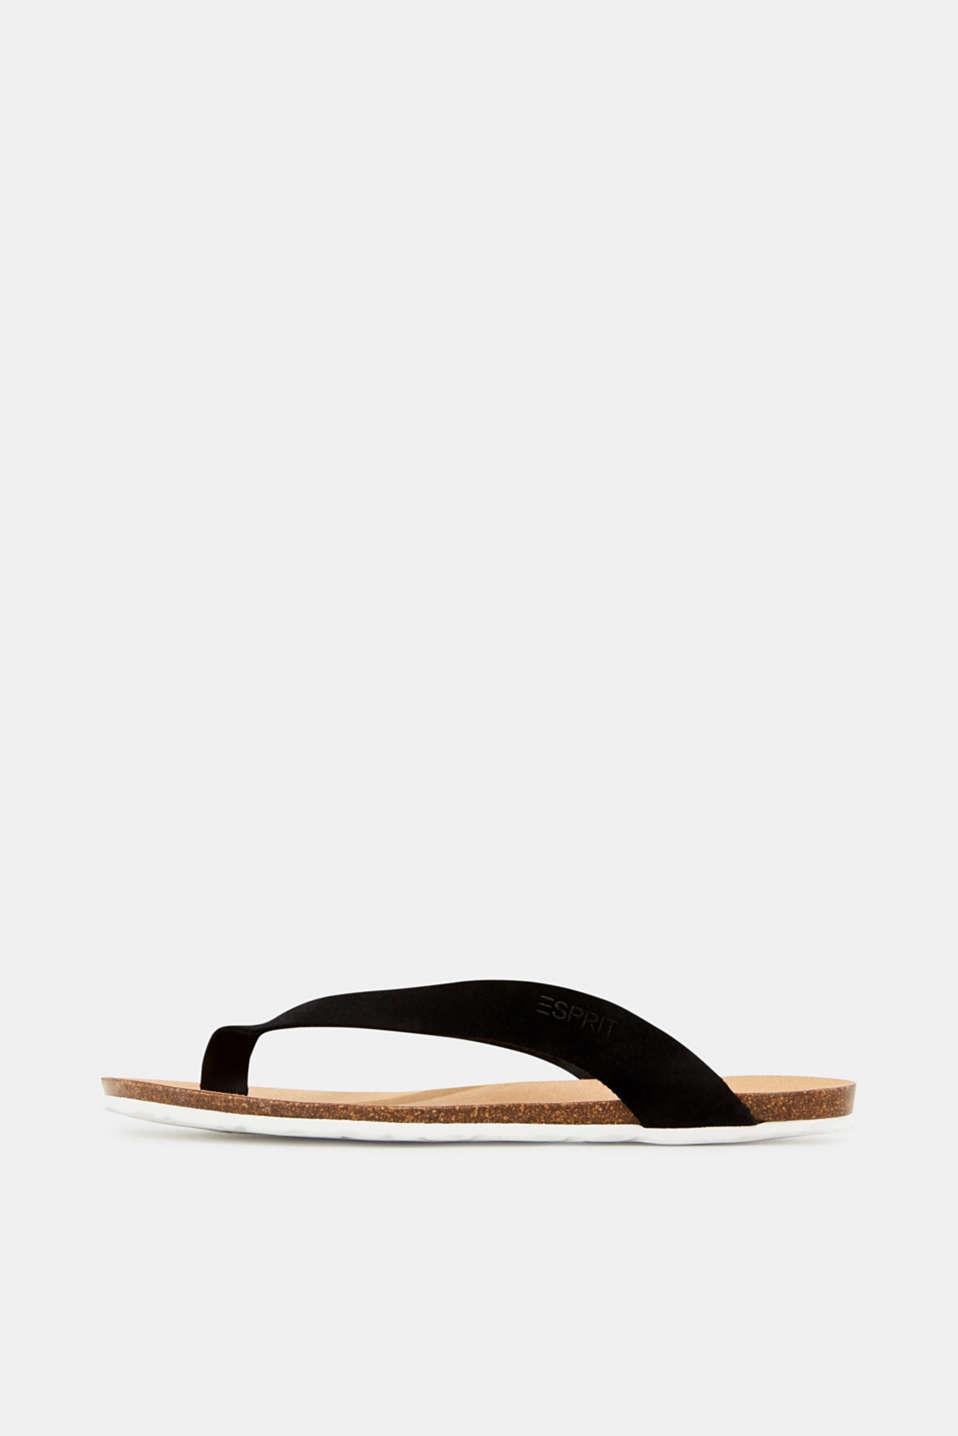 Leather toe-post slip-ons, BLACK, detail image number 0